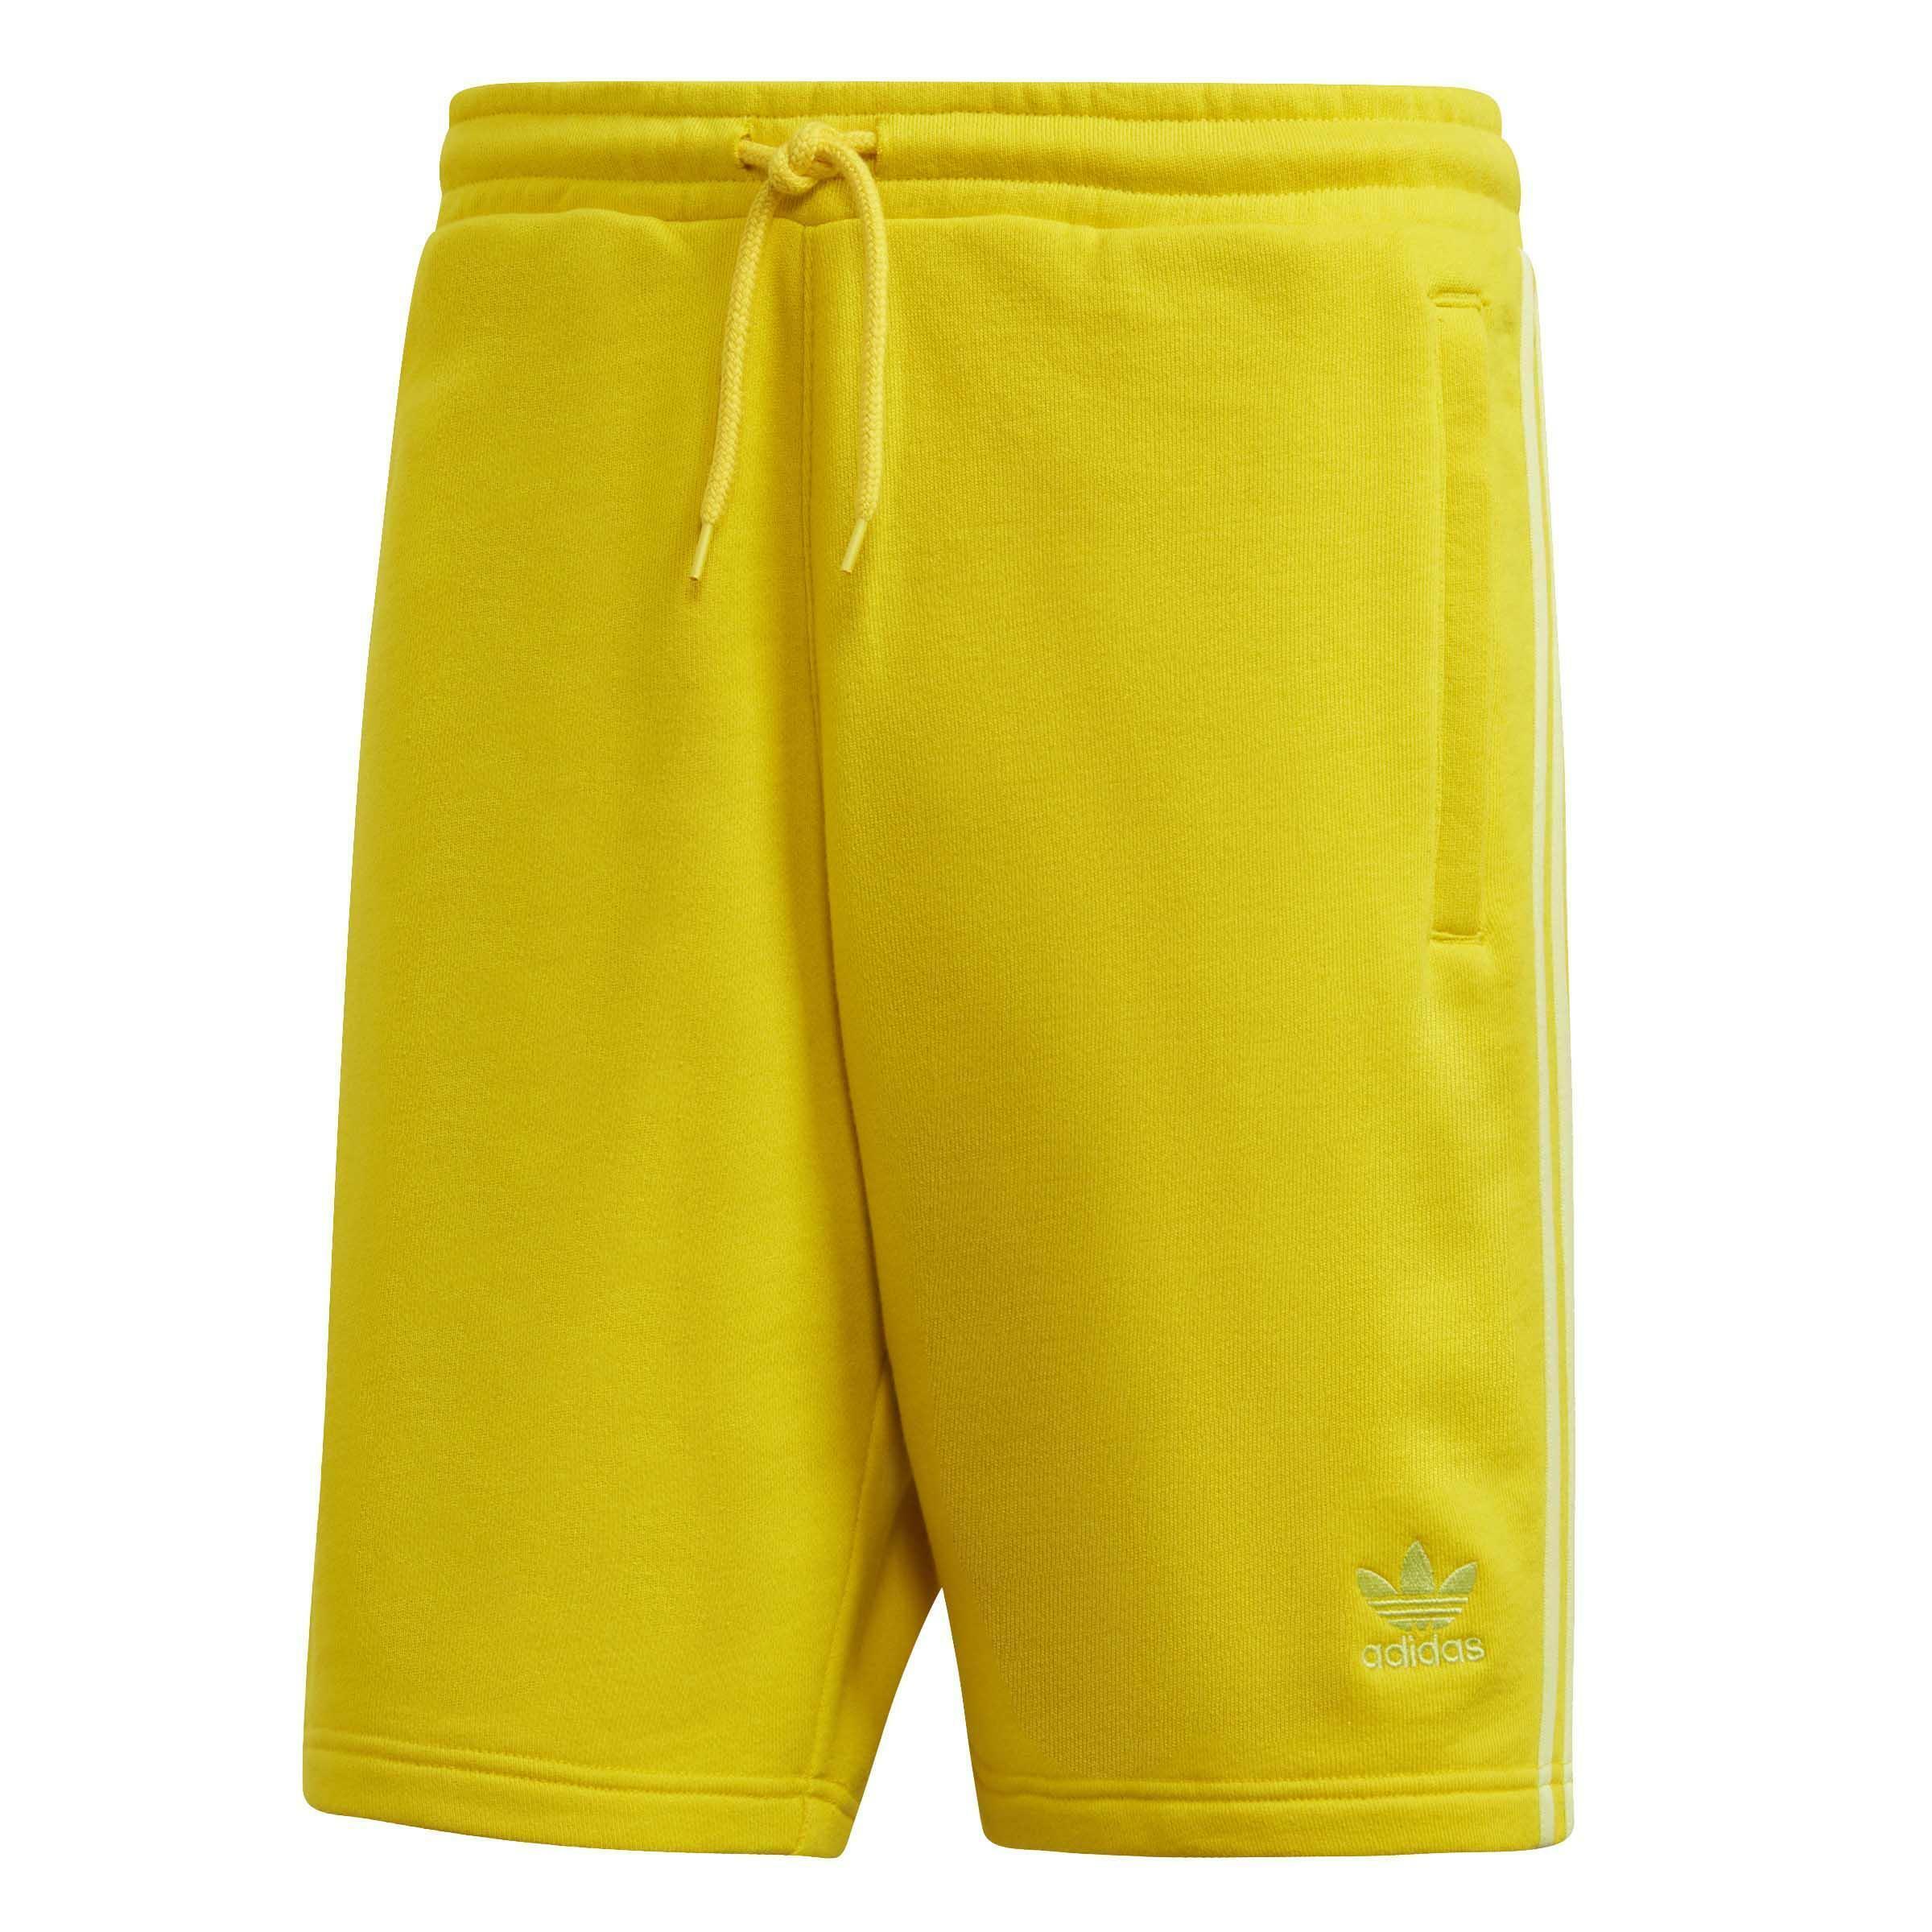 Uomo Ed6029 Gialli Adidas 3 Blc Pantaloncini Stripes 6f7vbyYg